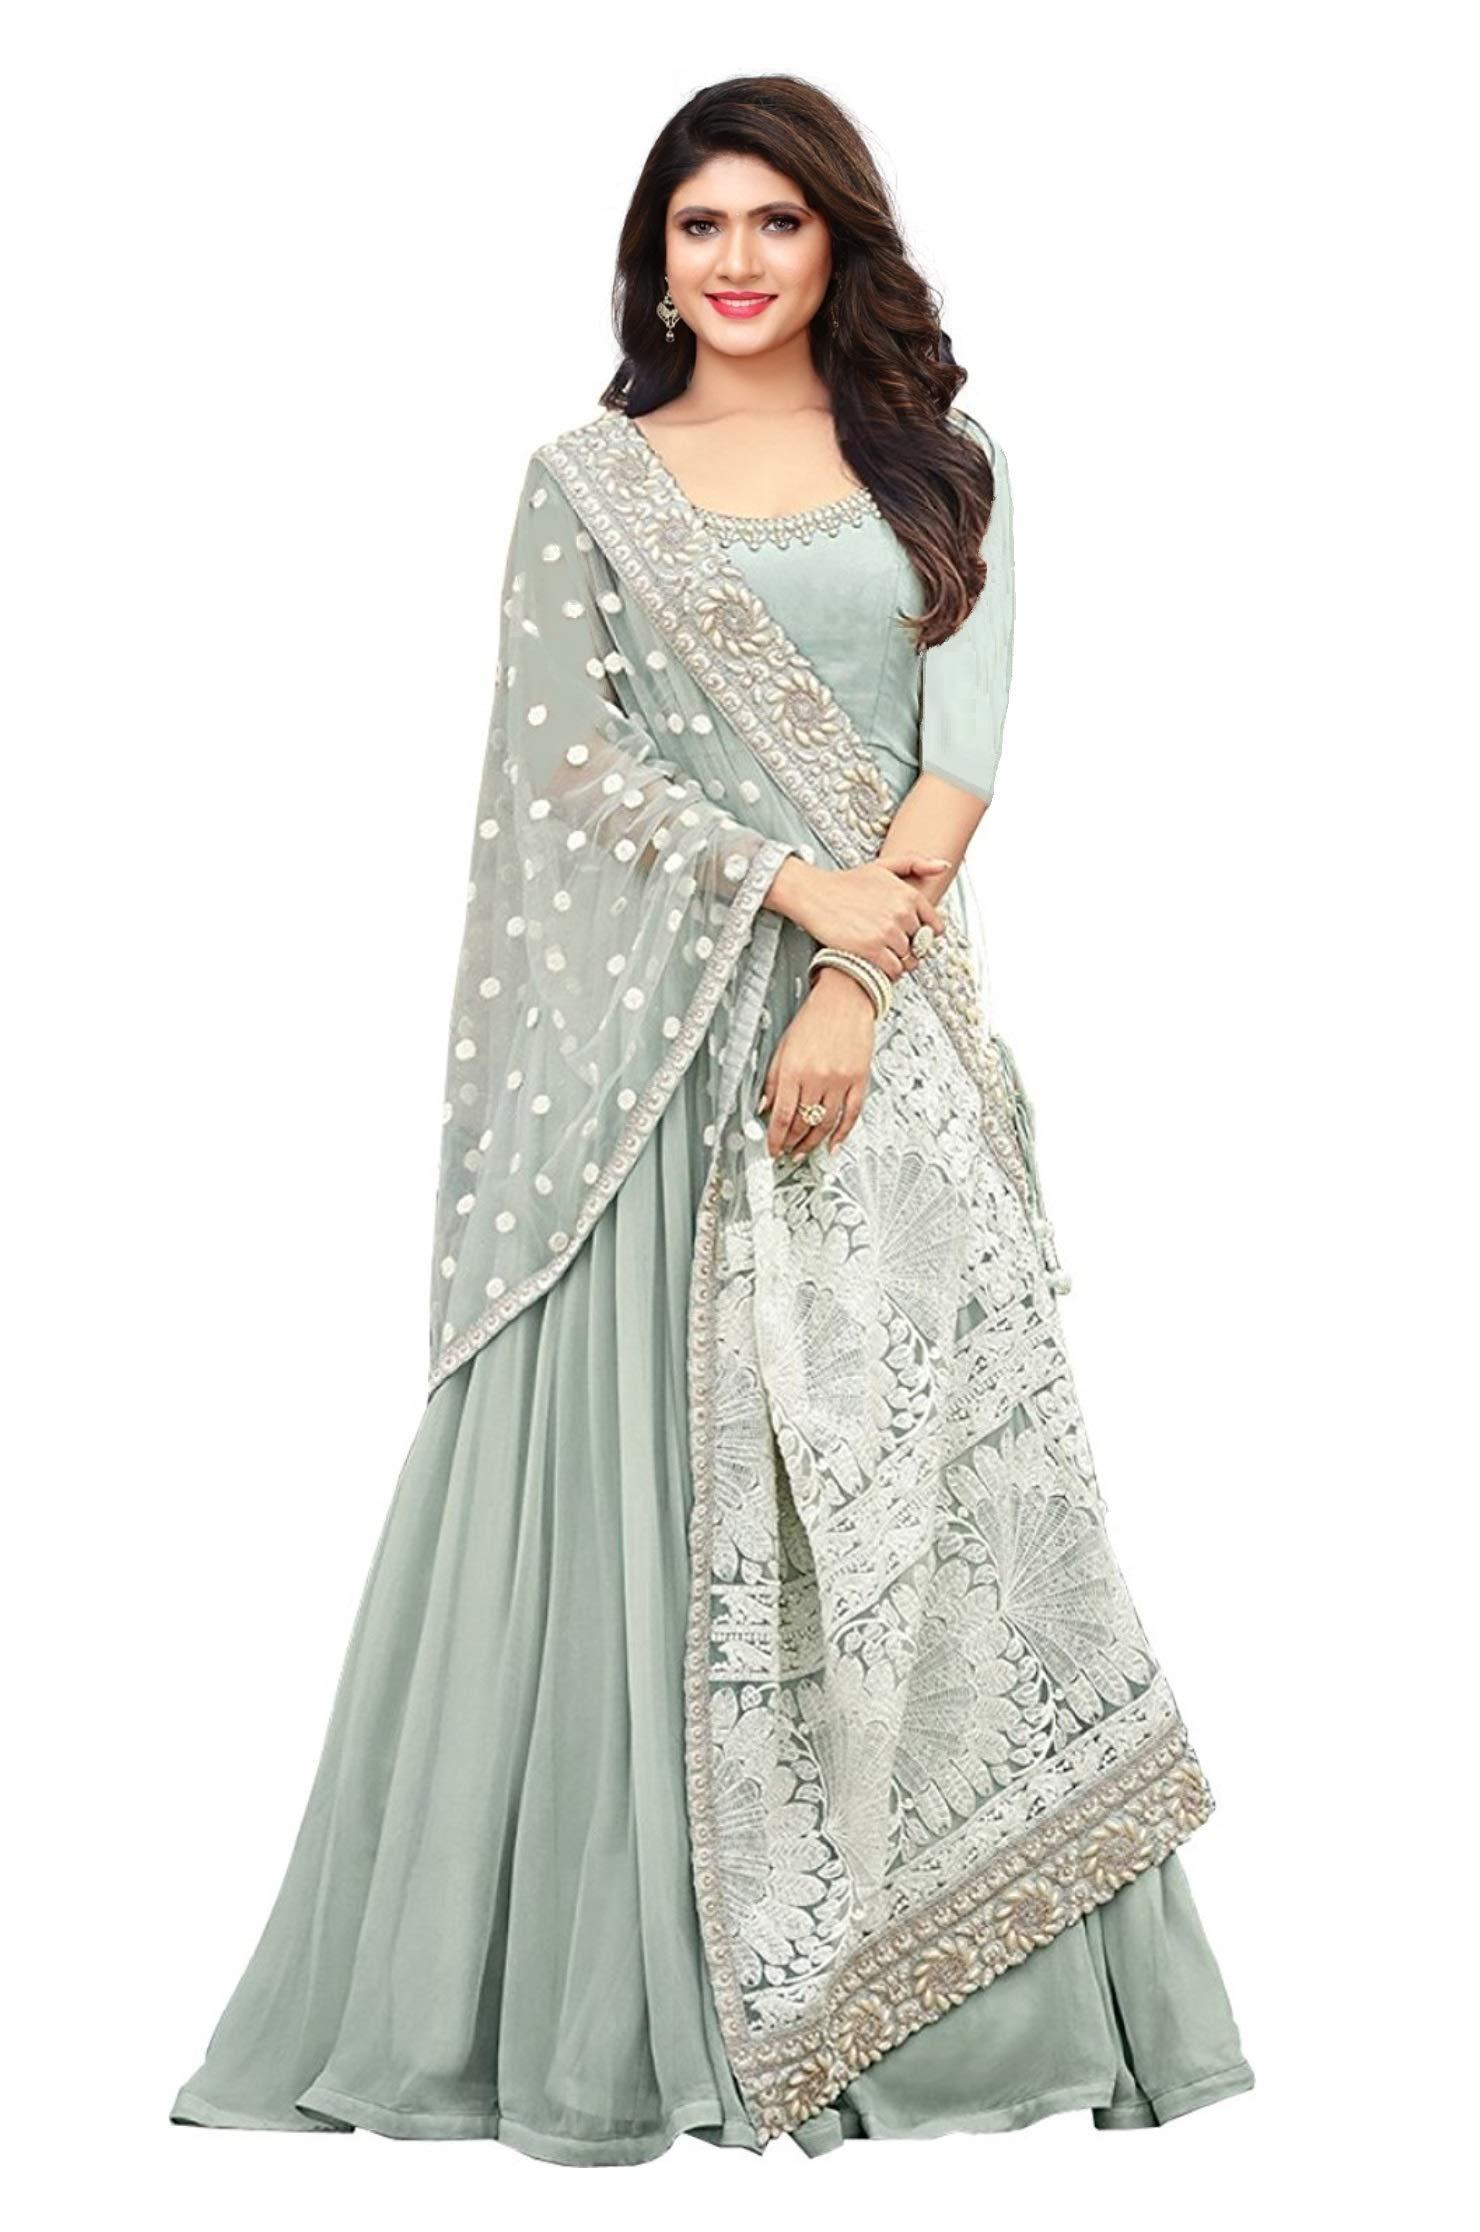 STELLACOUTURE Embroidered Salwar Suit Ethnic wear Indian Pakistani Anarkali Salwar Kameez Maisha (Sky Blue, XS-36)